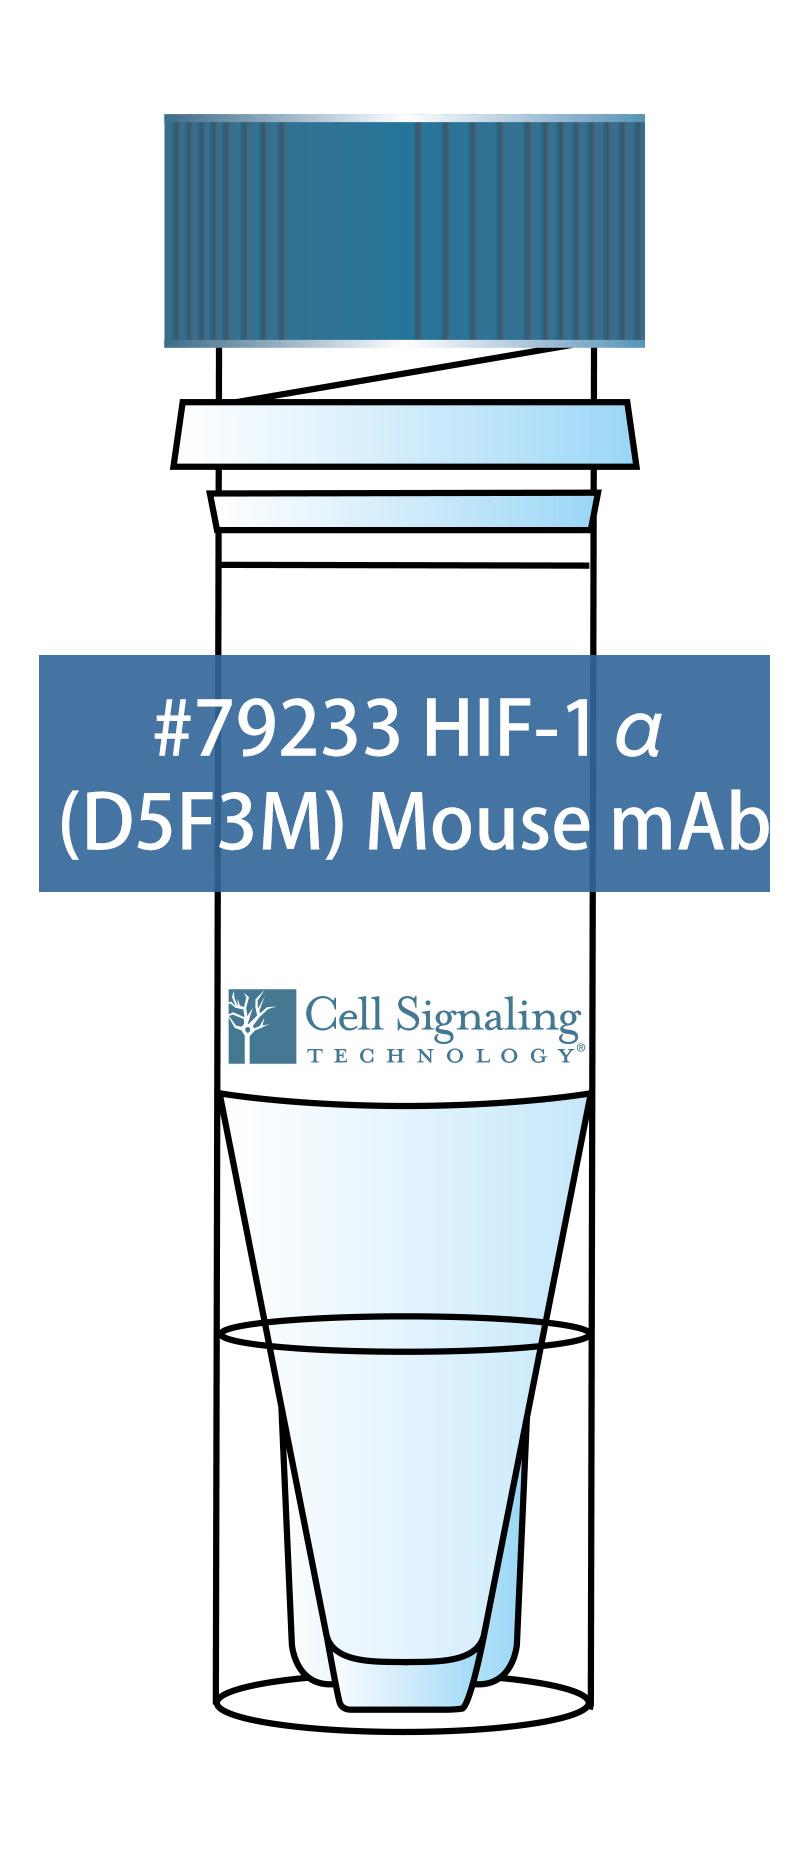 HIF-1α (D5F3M) Mouse mAb